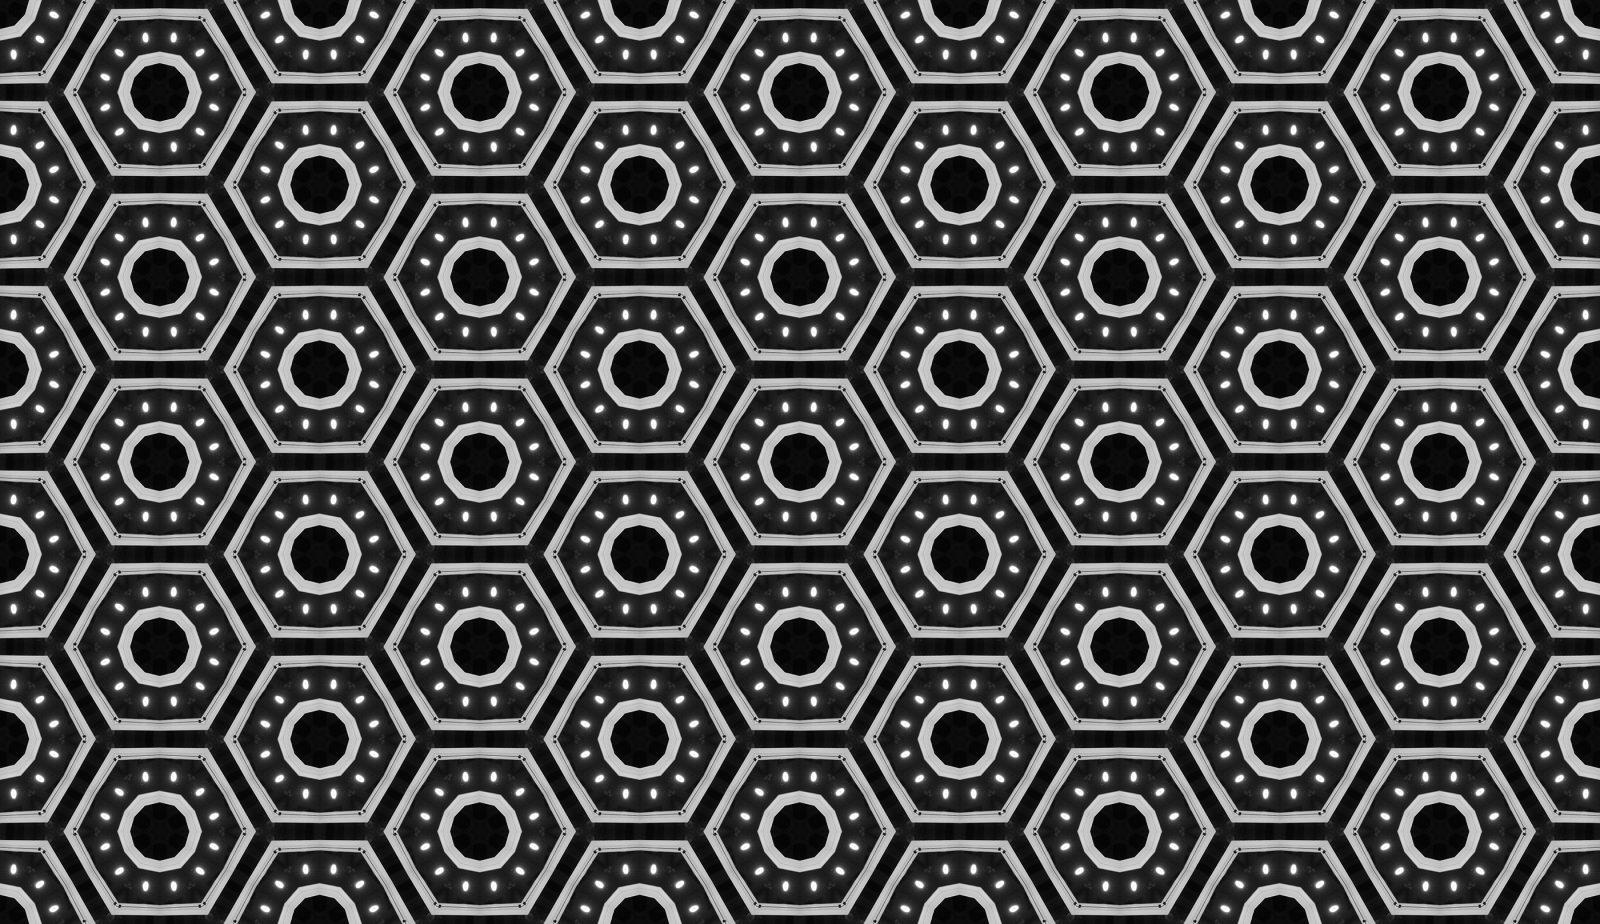 Honeycomb Futuristic Black White Pattern